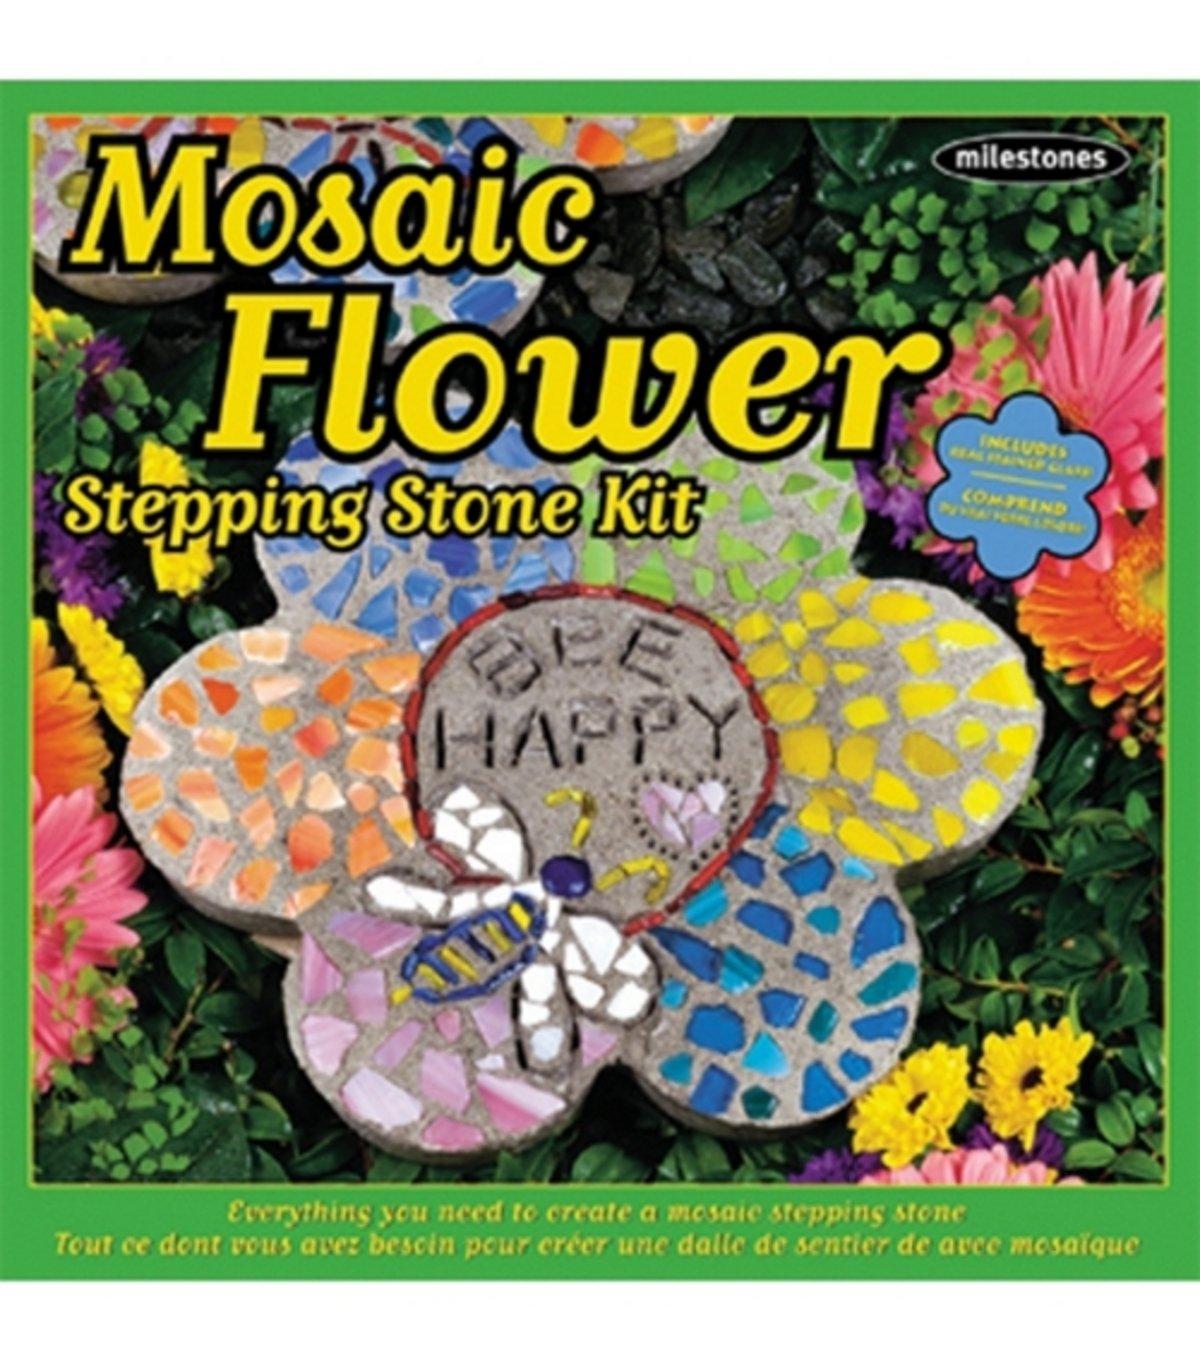 Mosaic Garden Stepping Stones Amazon milestones stepping stone kit 12 in mosaic flower toys amazon milestones stepping stone kit 12 in mosaic flower toys games workwithnaturefo